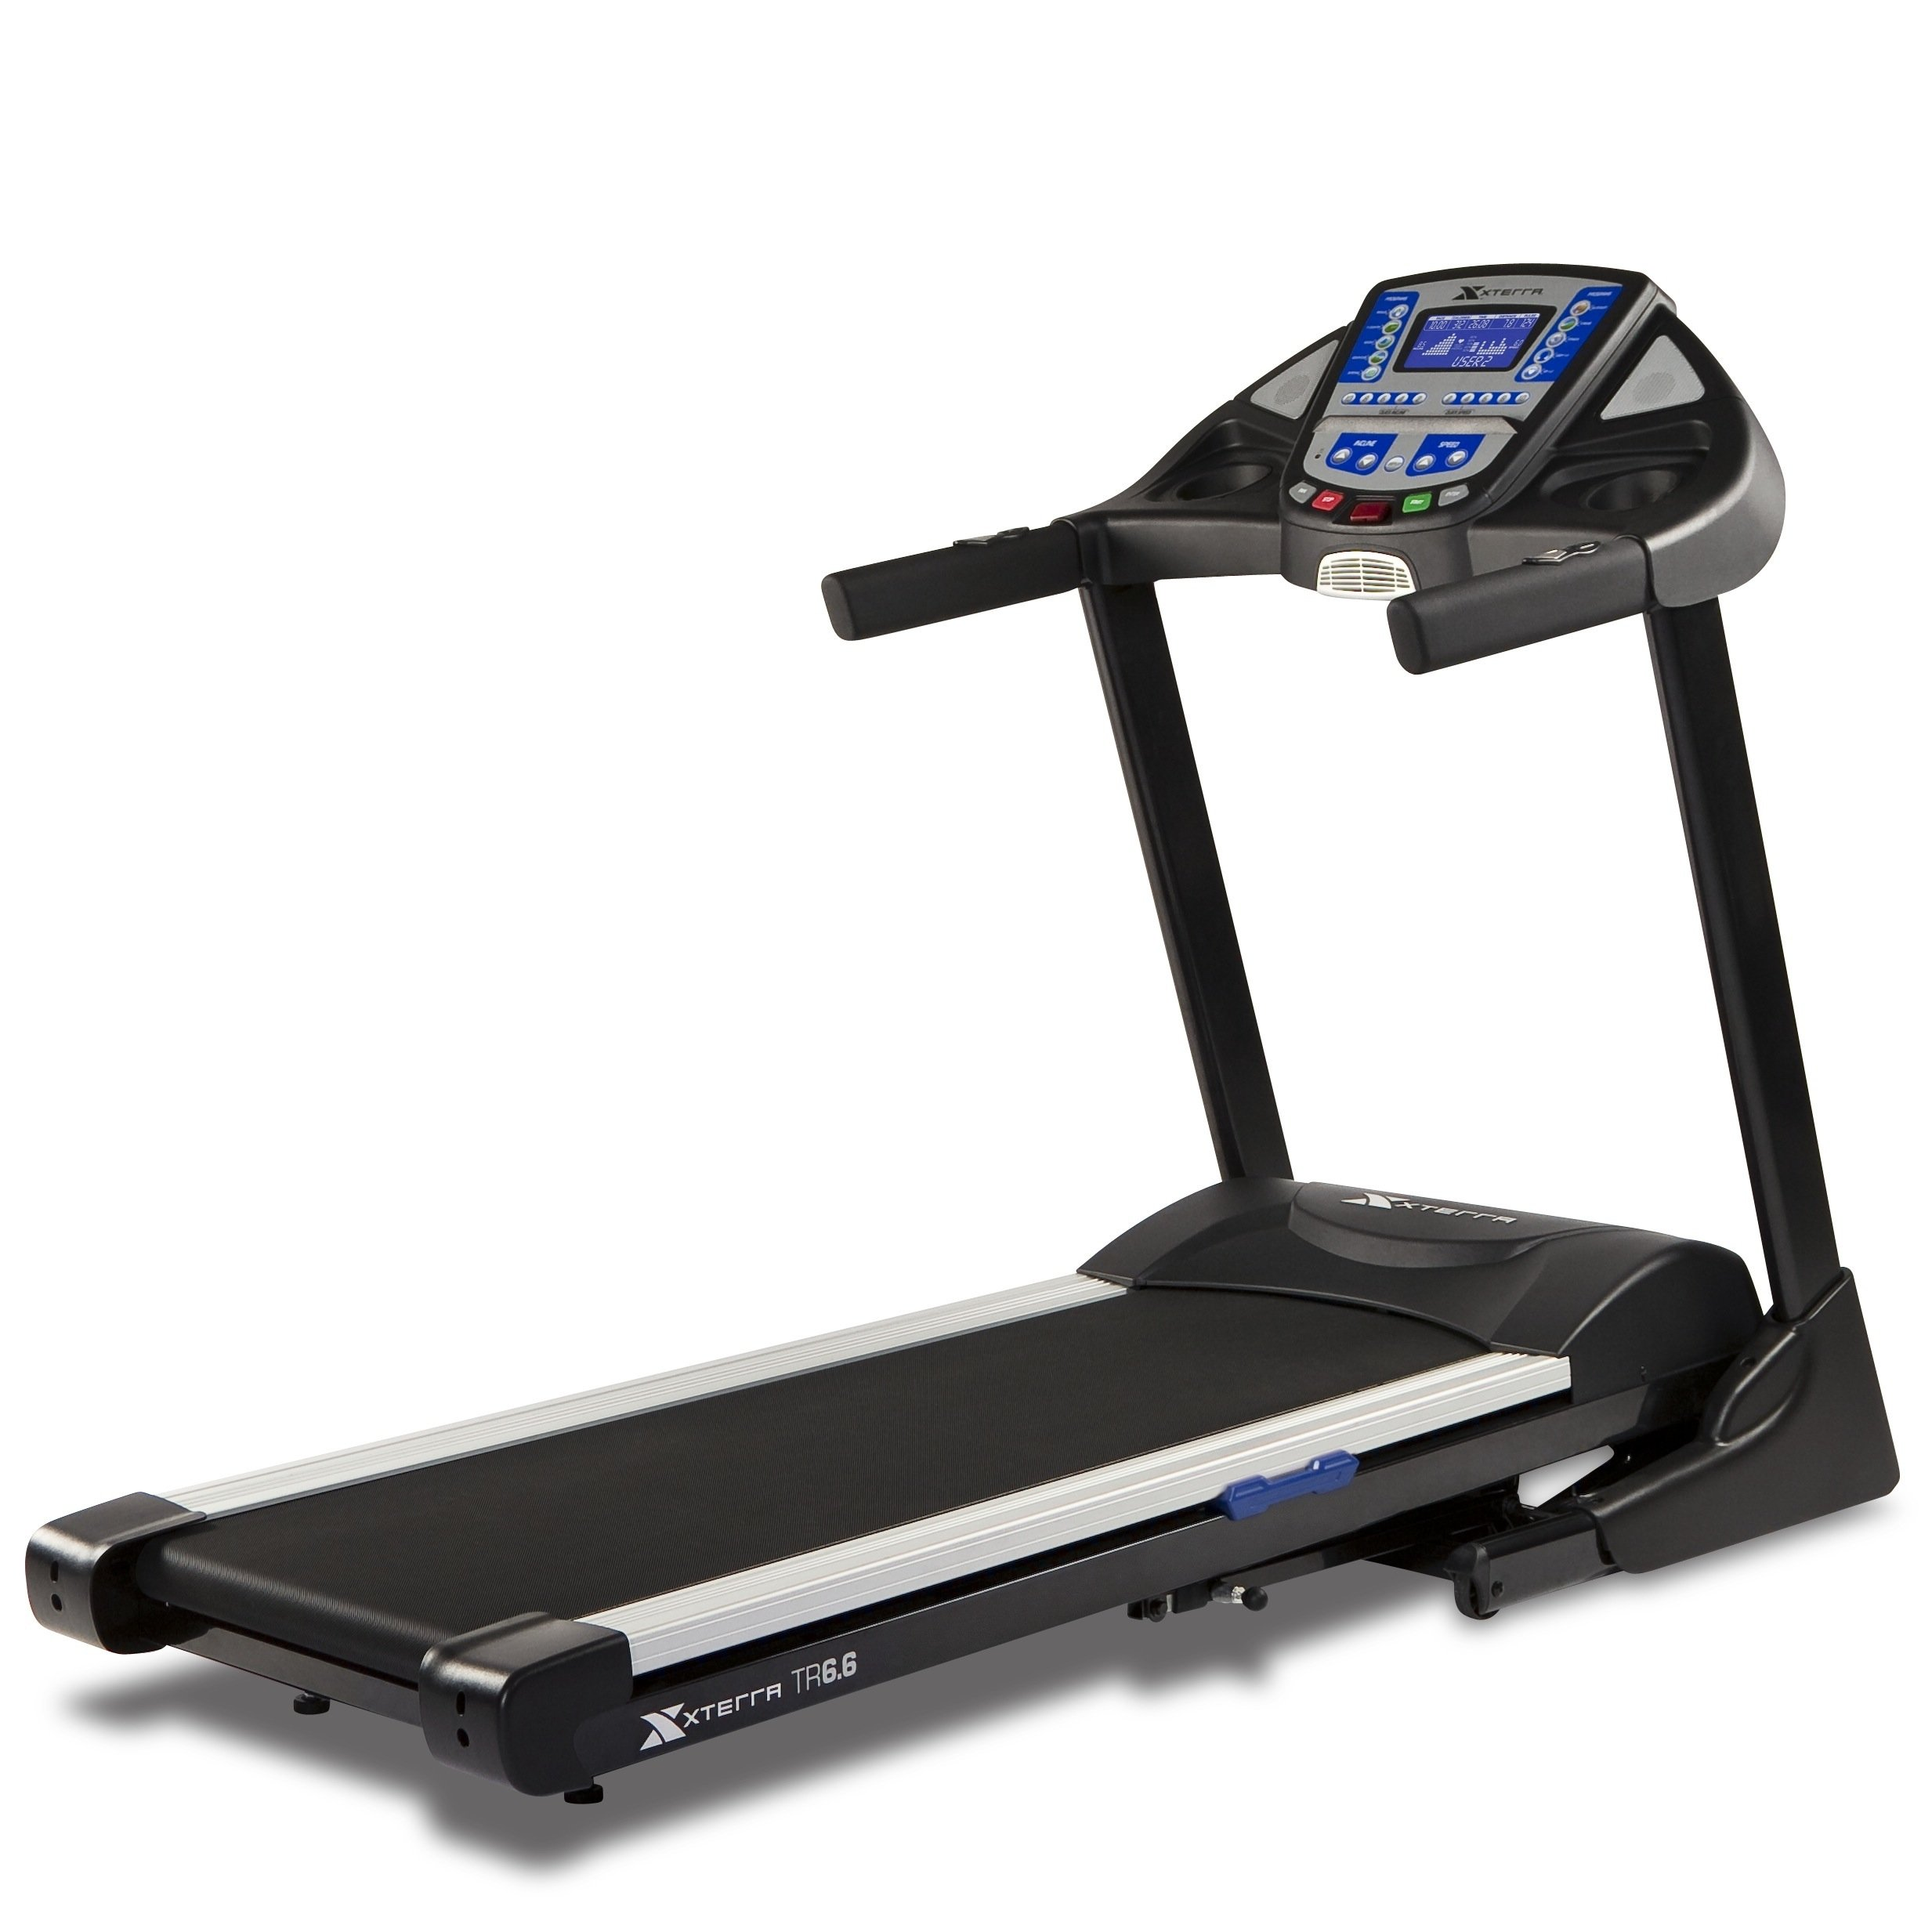 XTERRA Fitness TR6.6 Folding Treadmill by Xterra Fitness